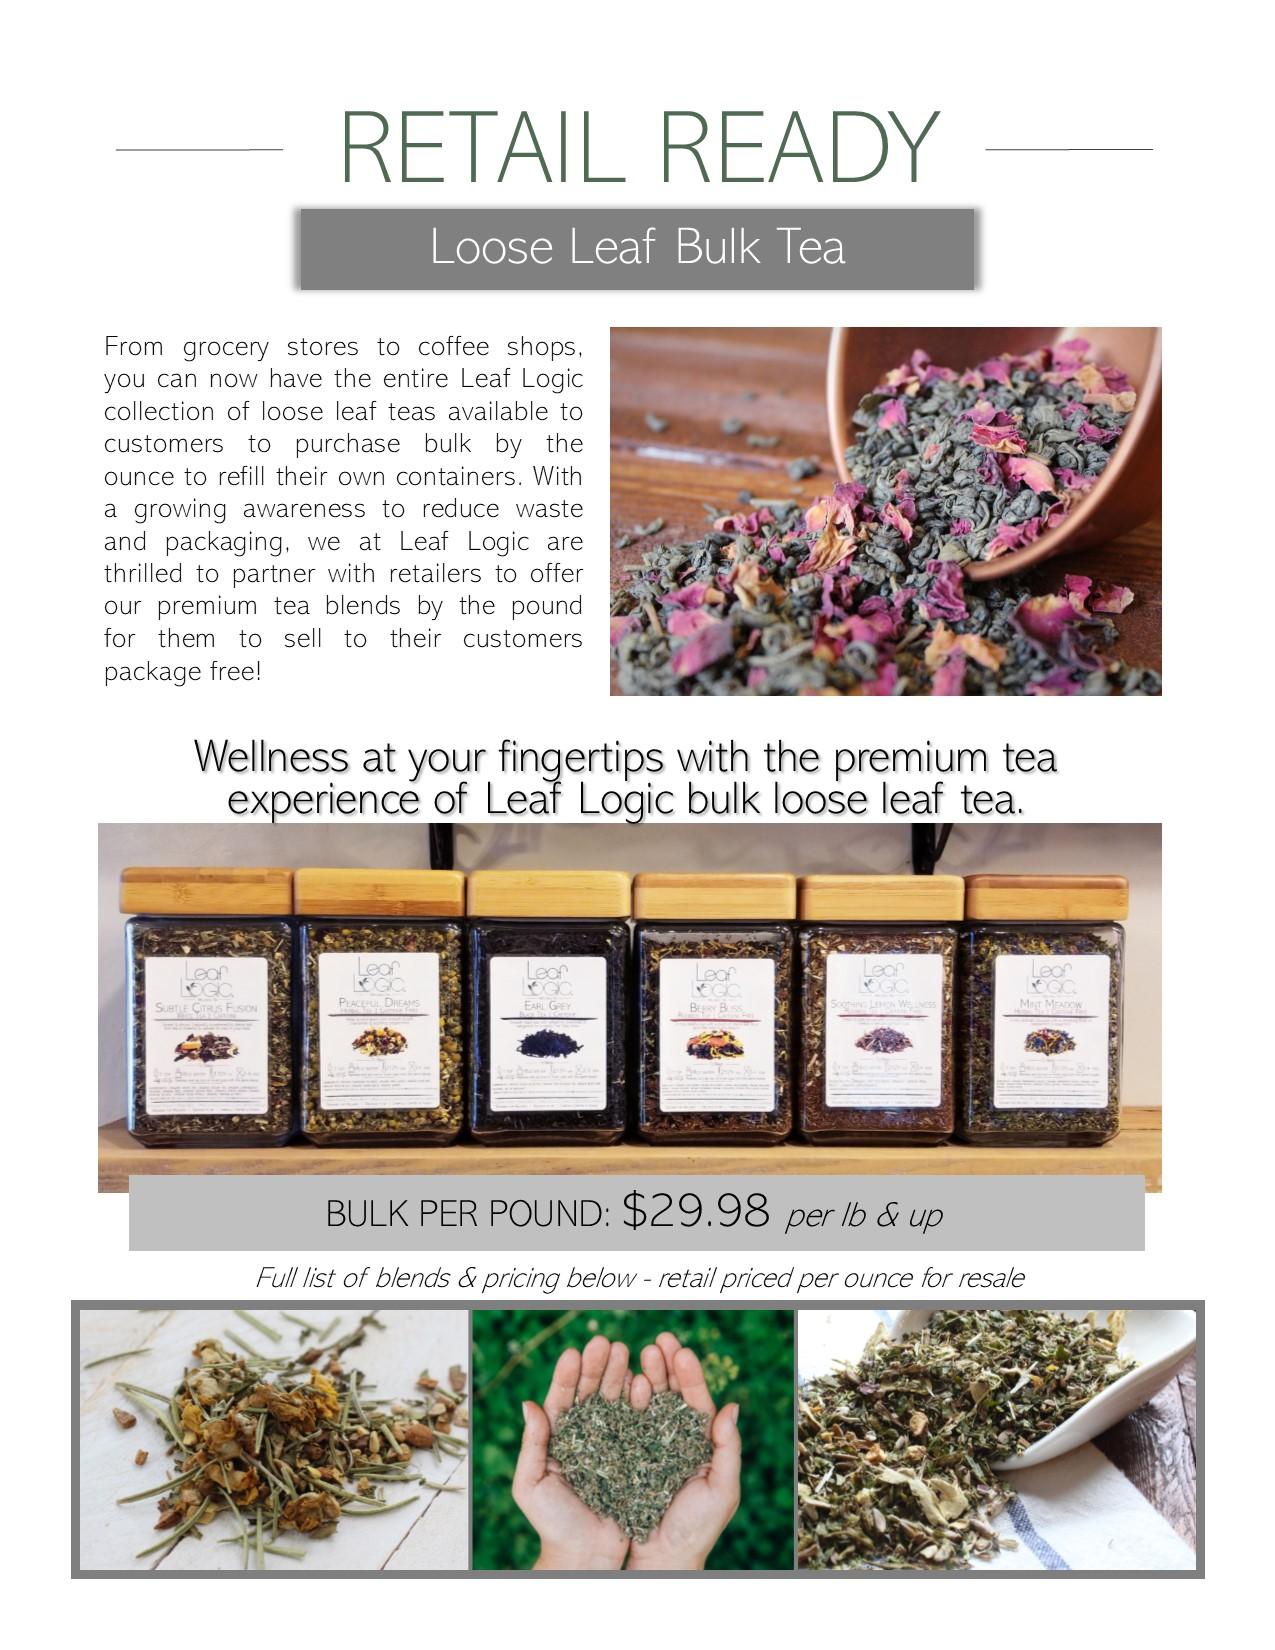 Leaf Logic Wholesale Catalog 2018 - page 8.jpg